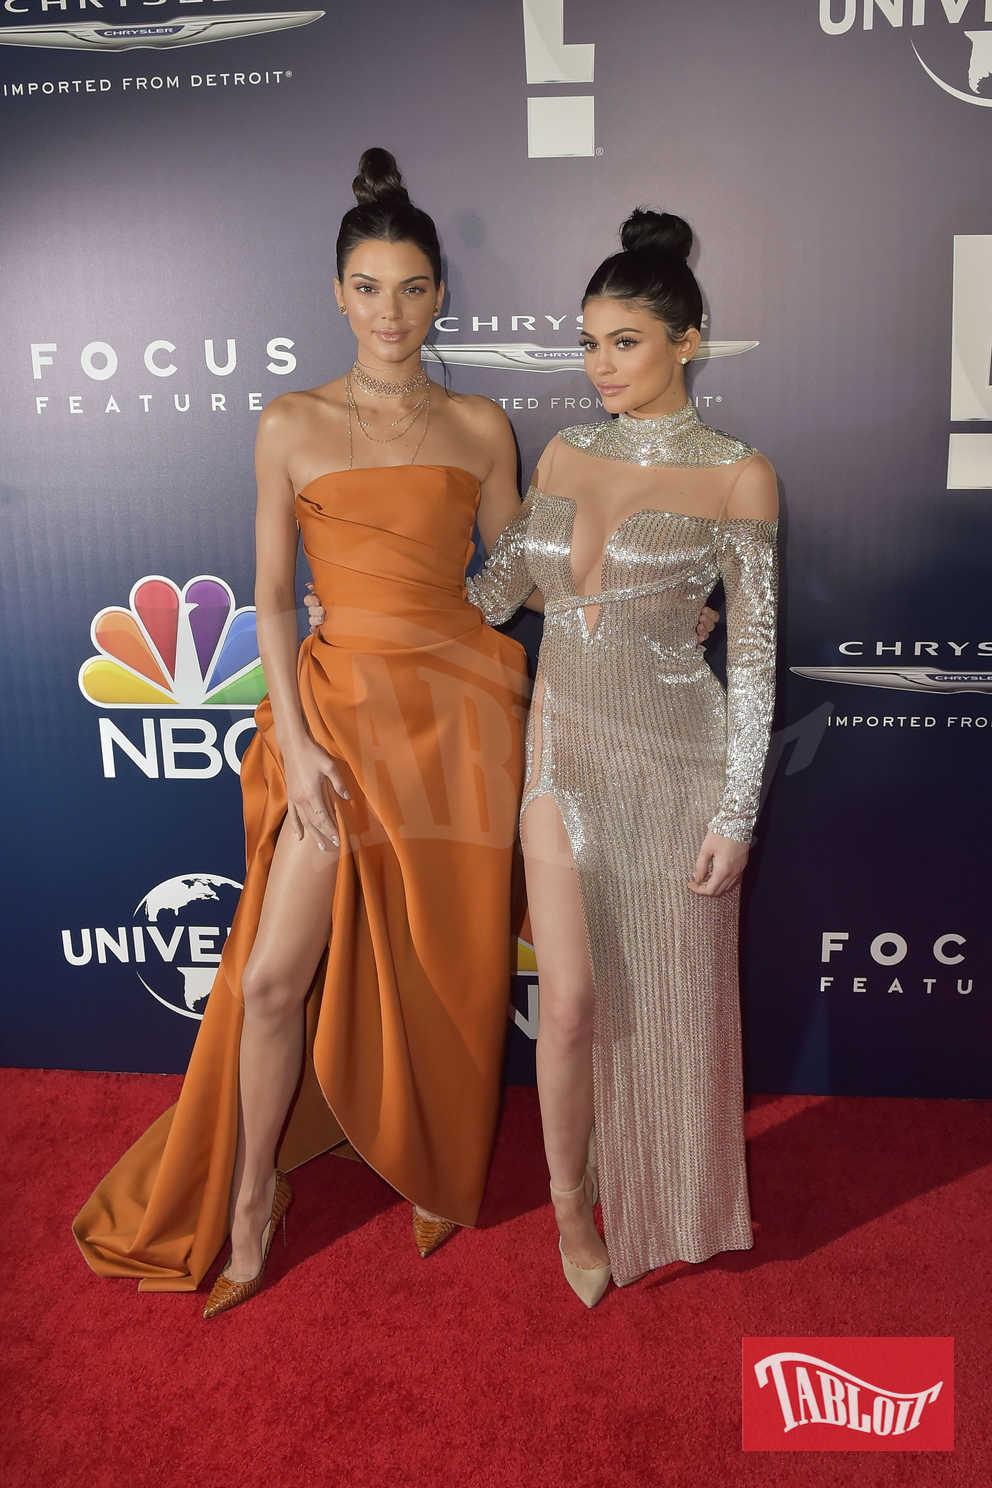 Chignon altissimo per Kendall e Kylie Jenner